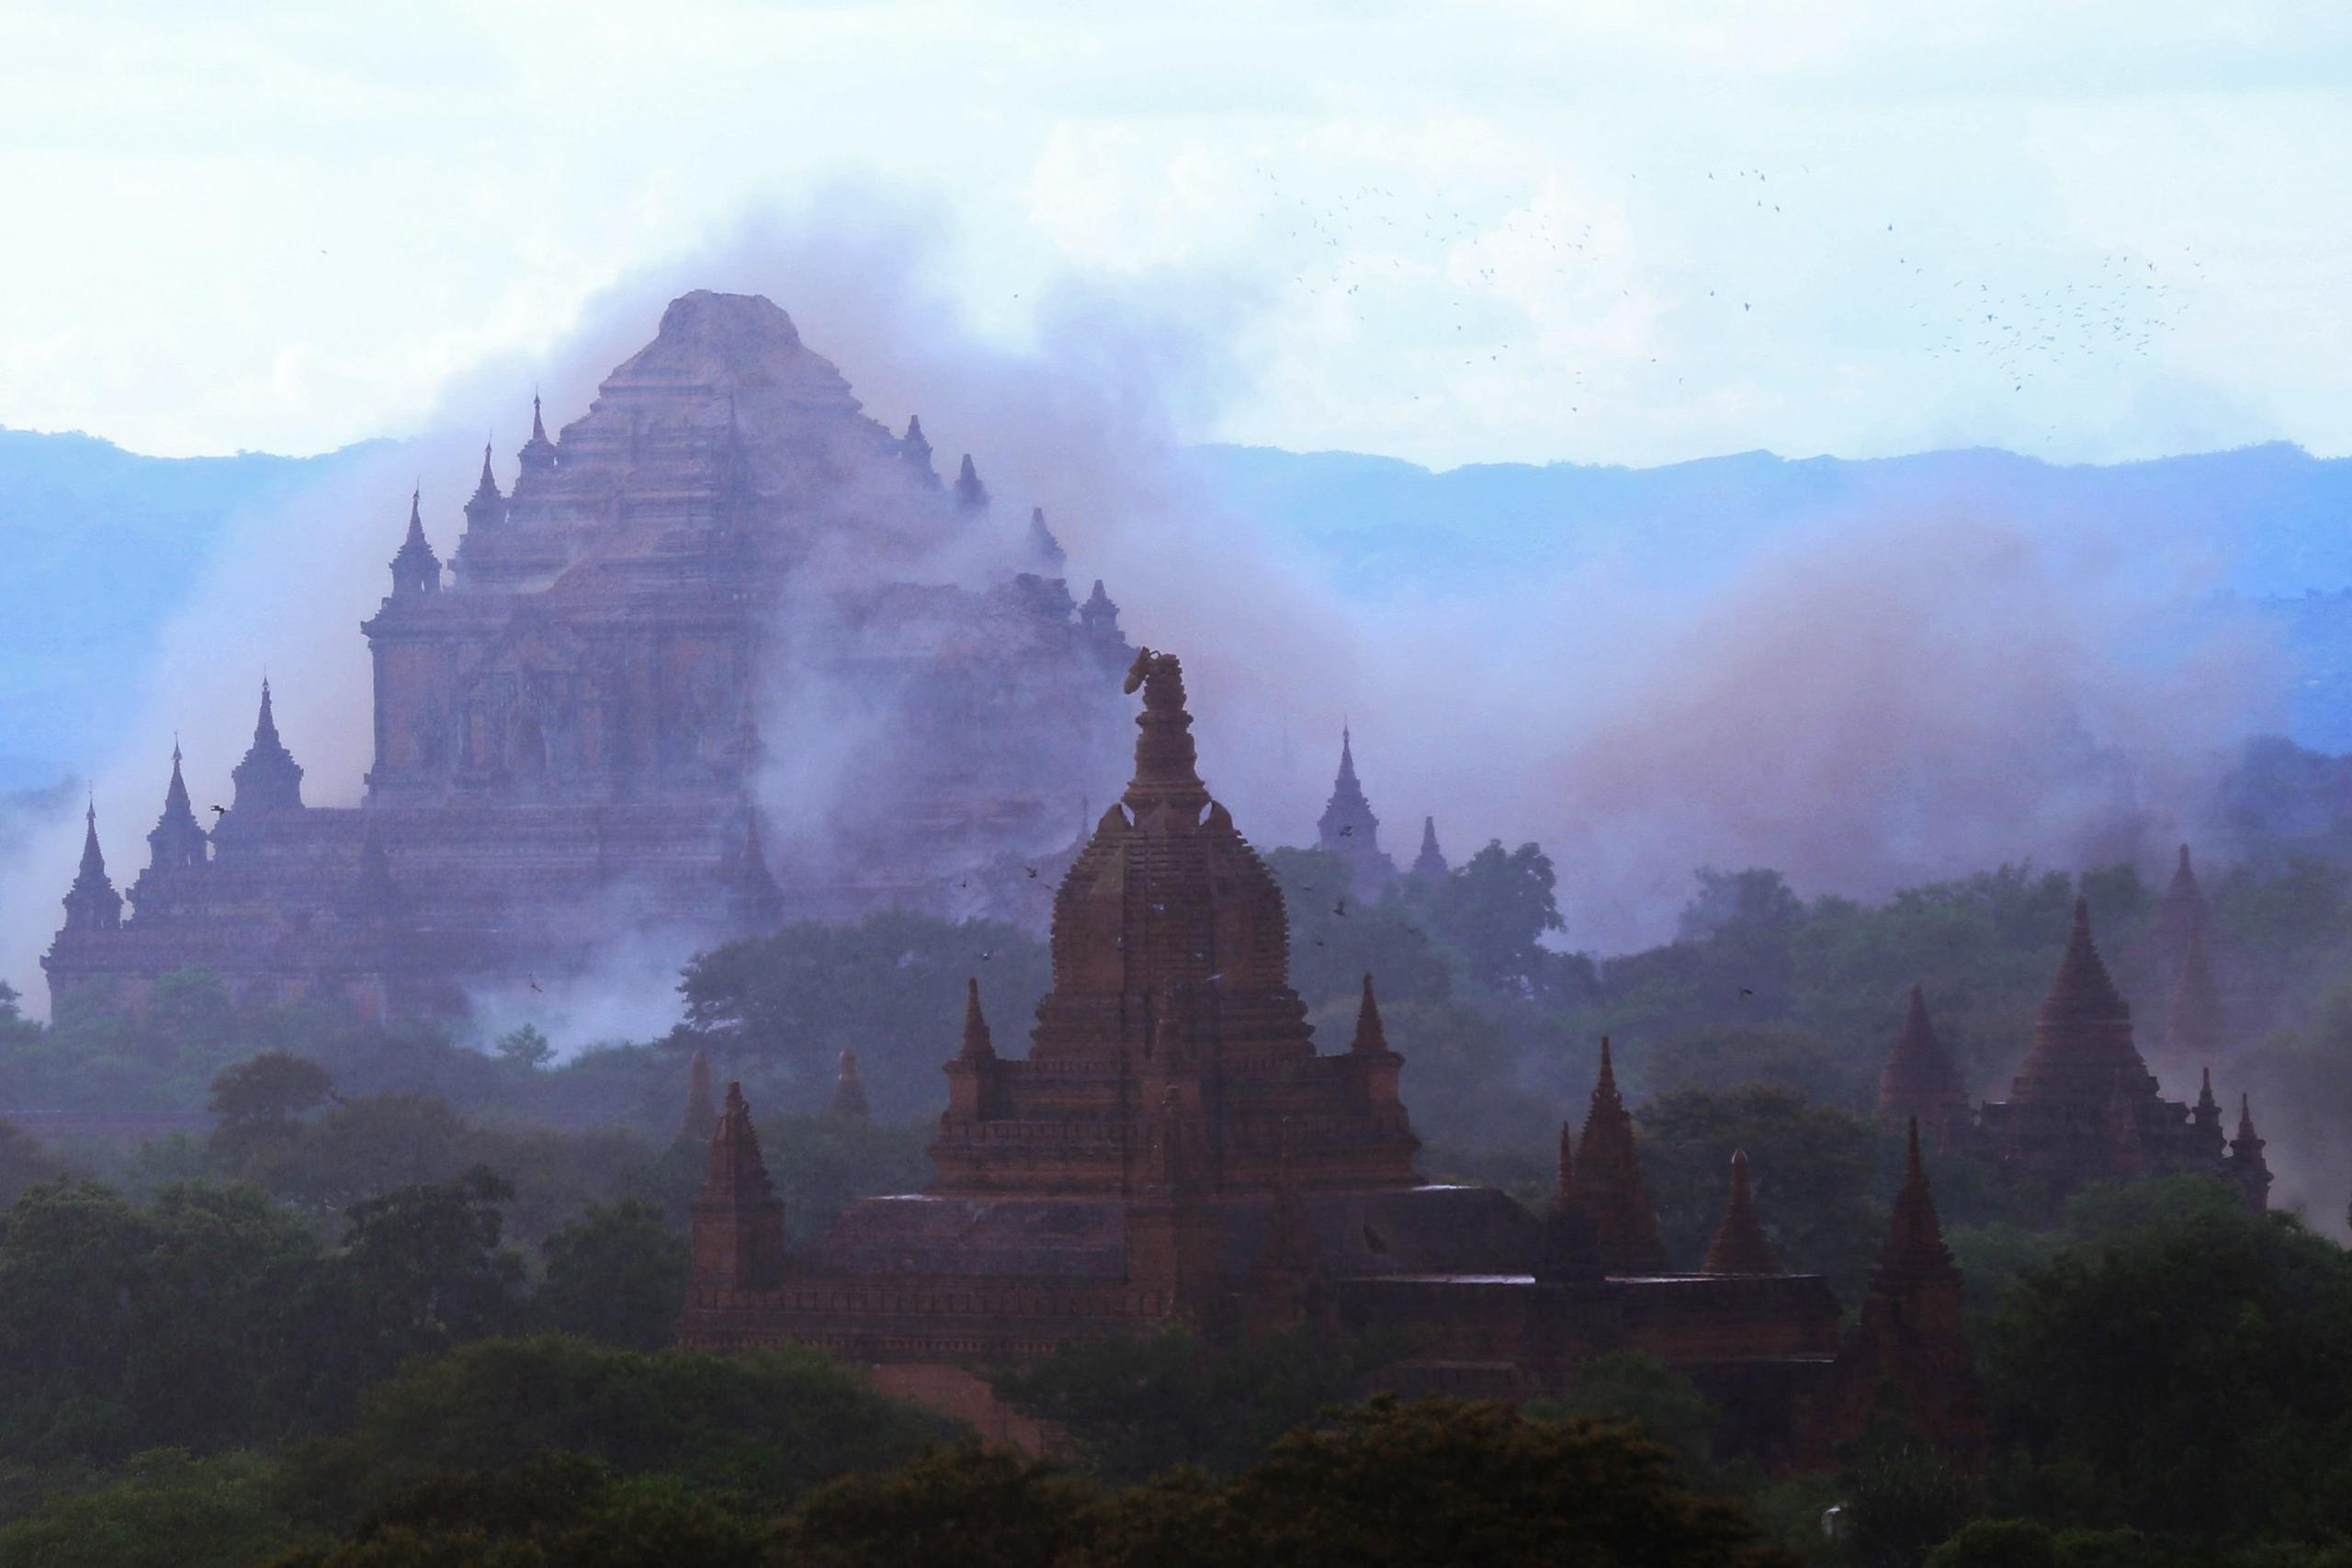 At Least 4 Dead in 6.8-Magnitude Earthquake In Burma